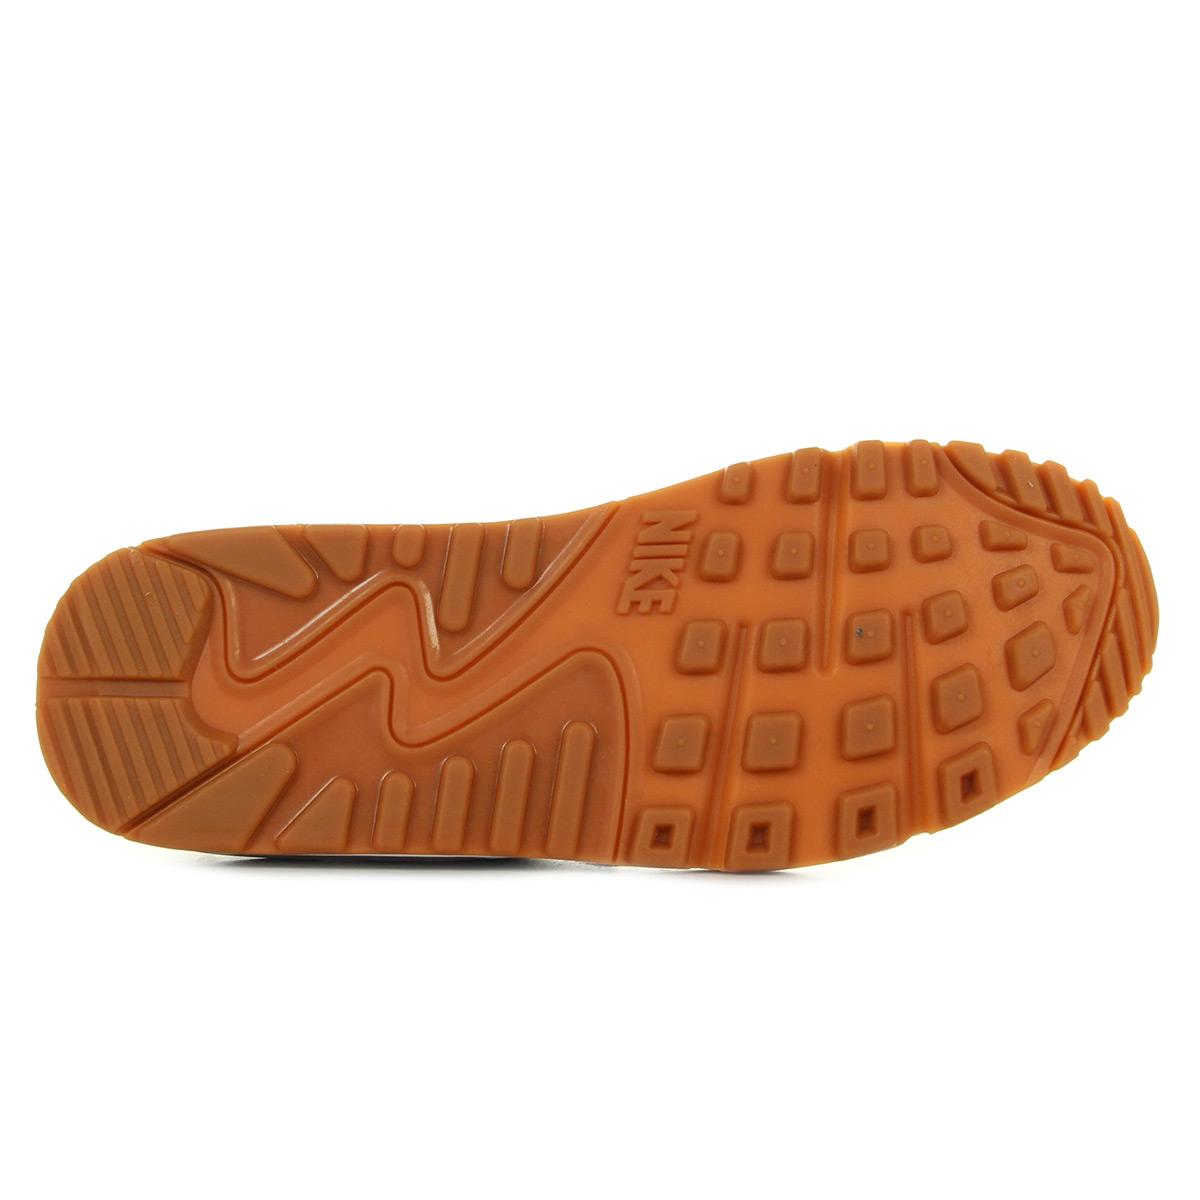 Nike Air Max 90 Prm 896497601, Baskets mode femme